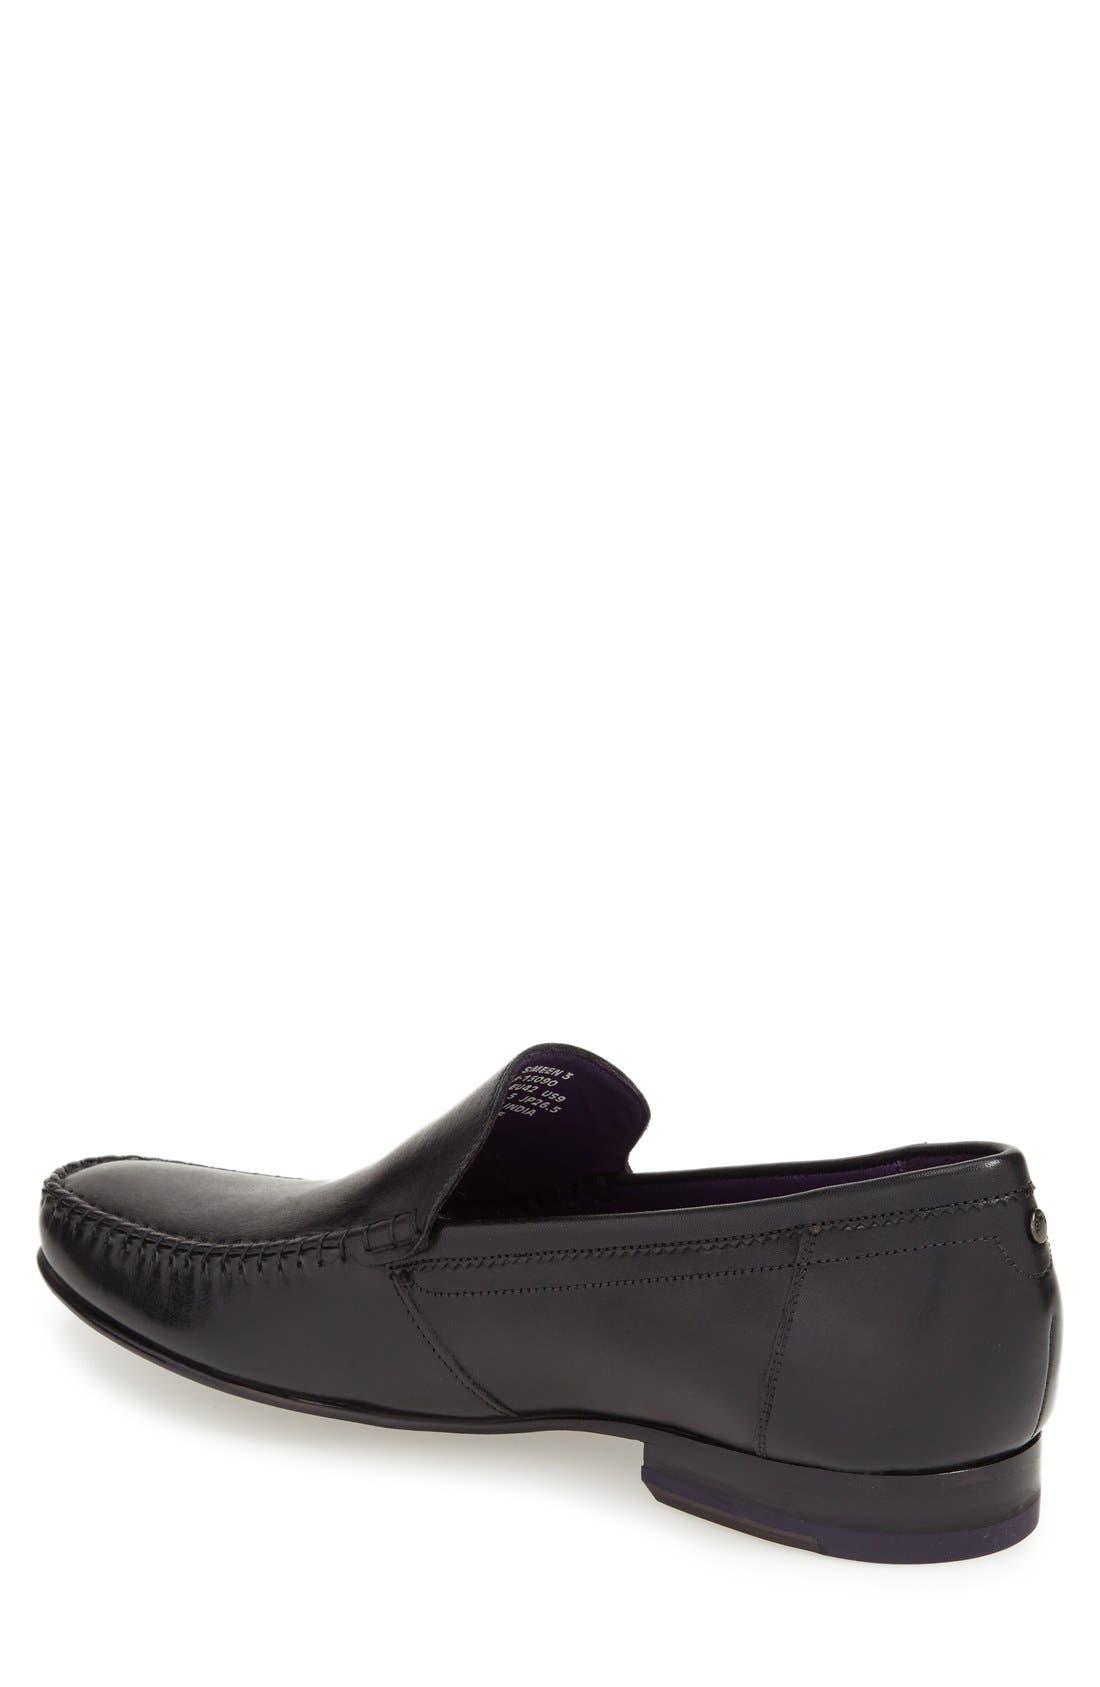 'Simeen 3' Venetian Loafer,                             Alternate thumbnail 5, color,                             001